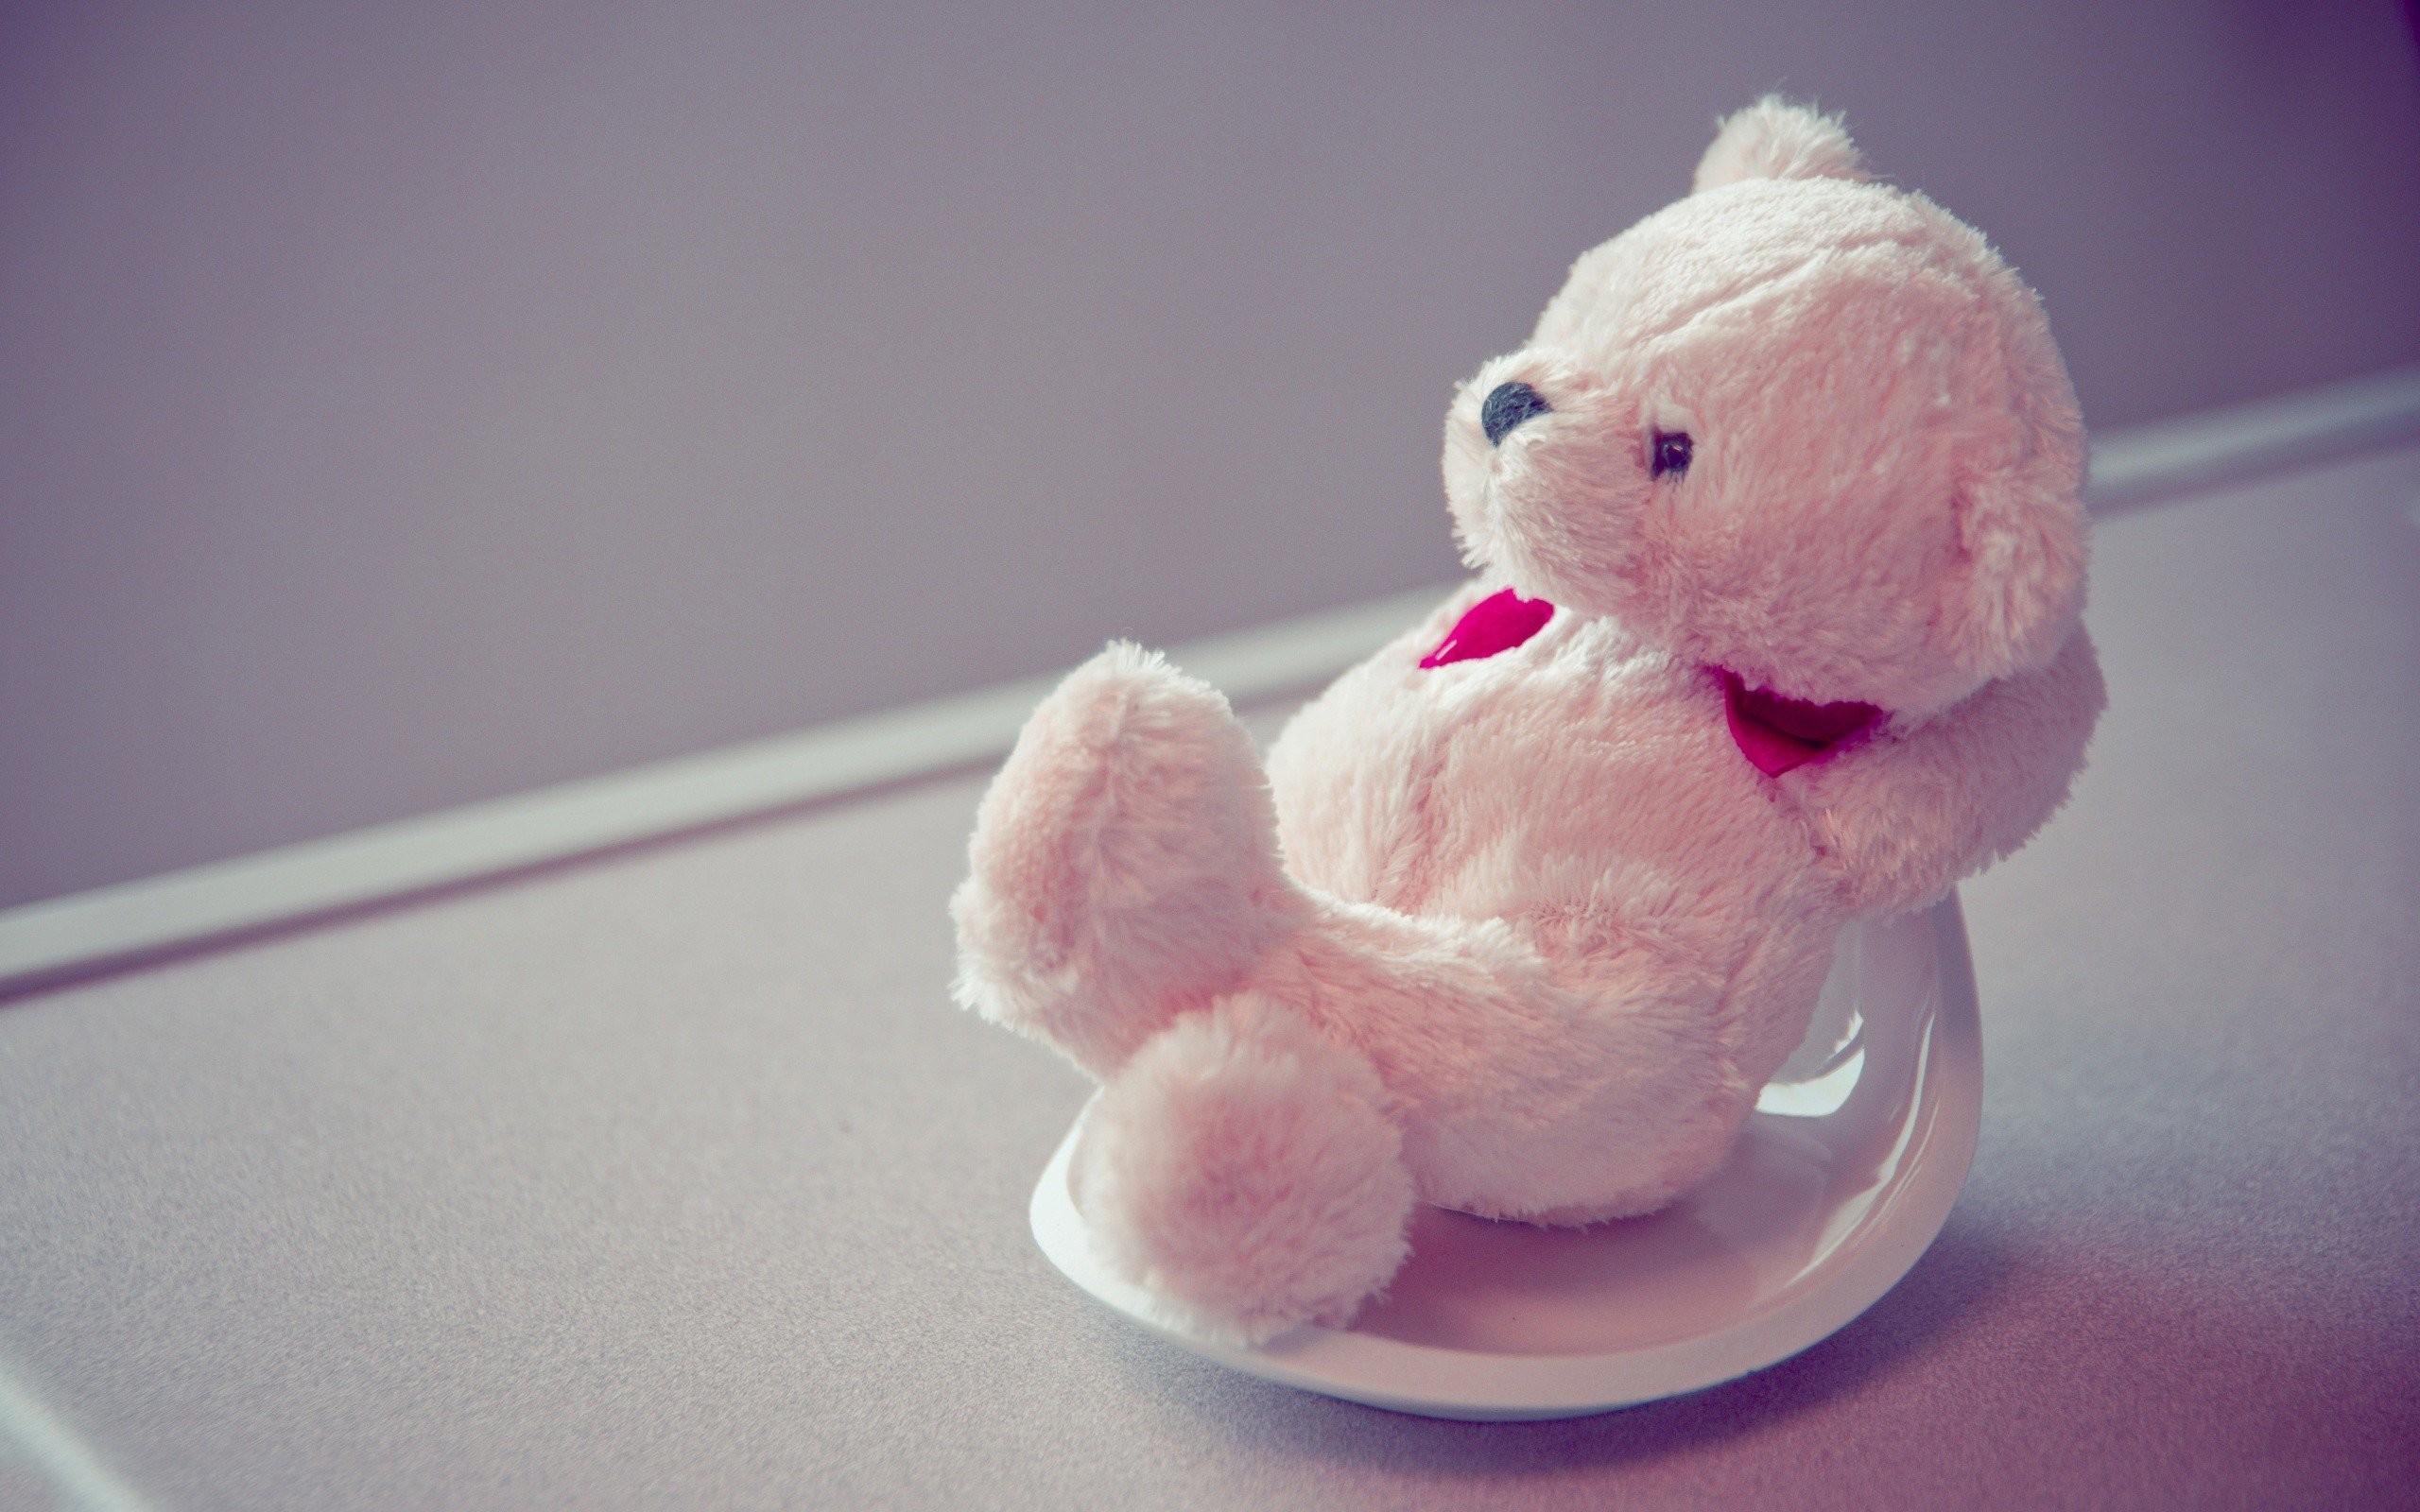 Pink Teddy Bear Wallpaper